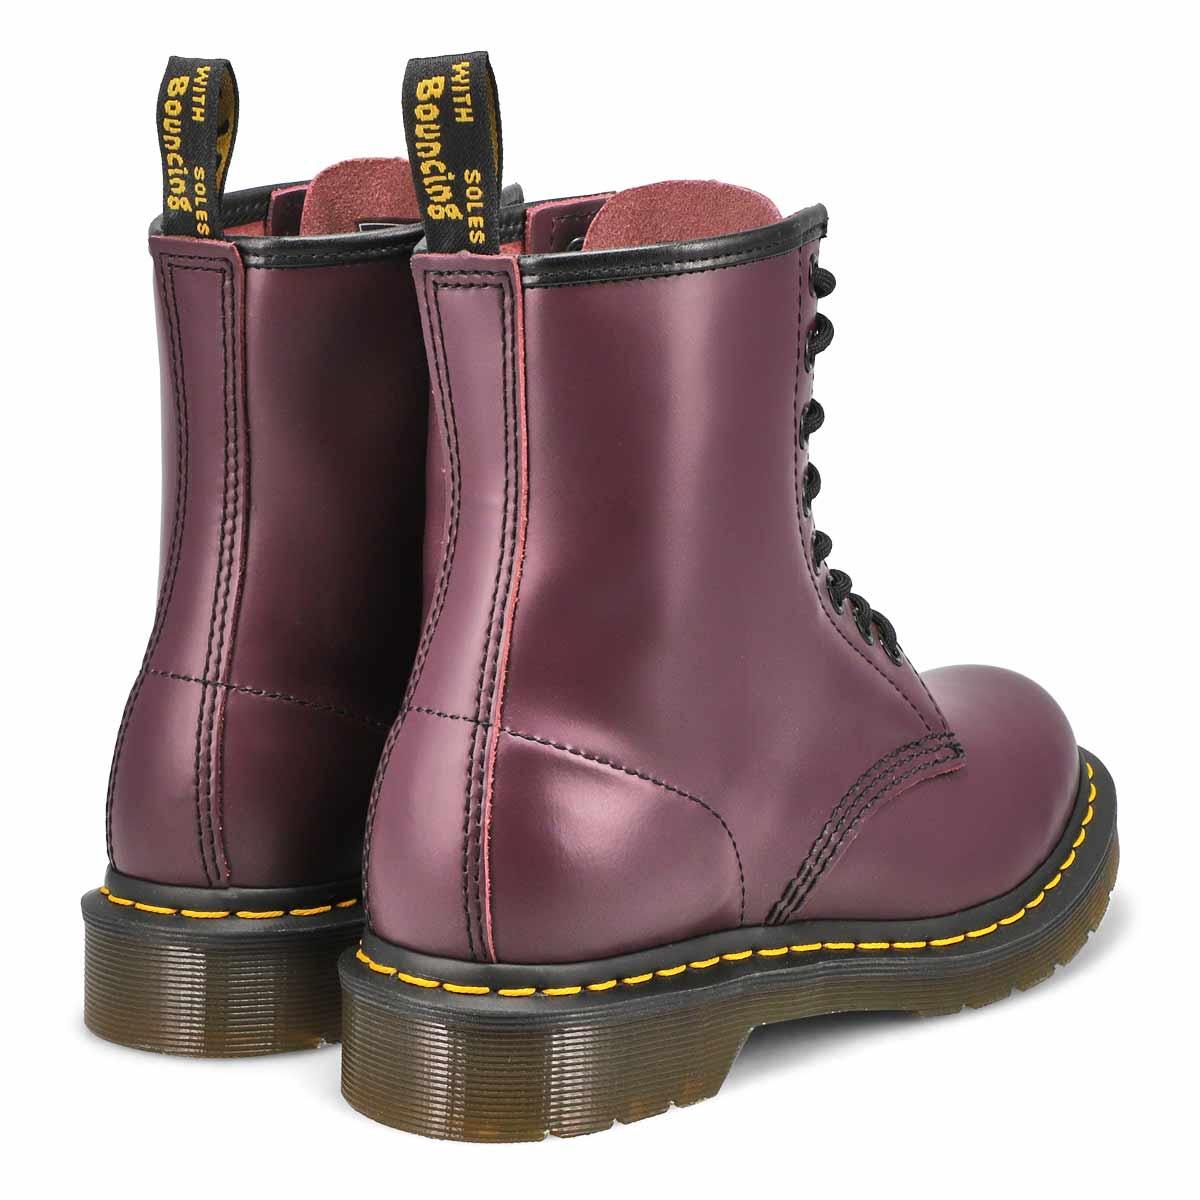 Bottes 1460 à 8 œillets, cuir lisse violet, femmes